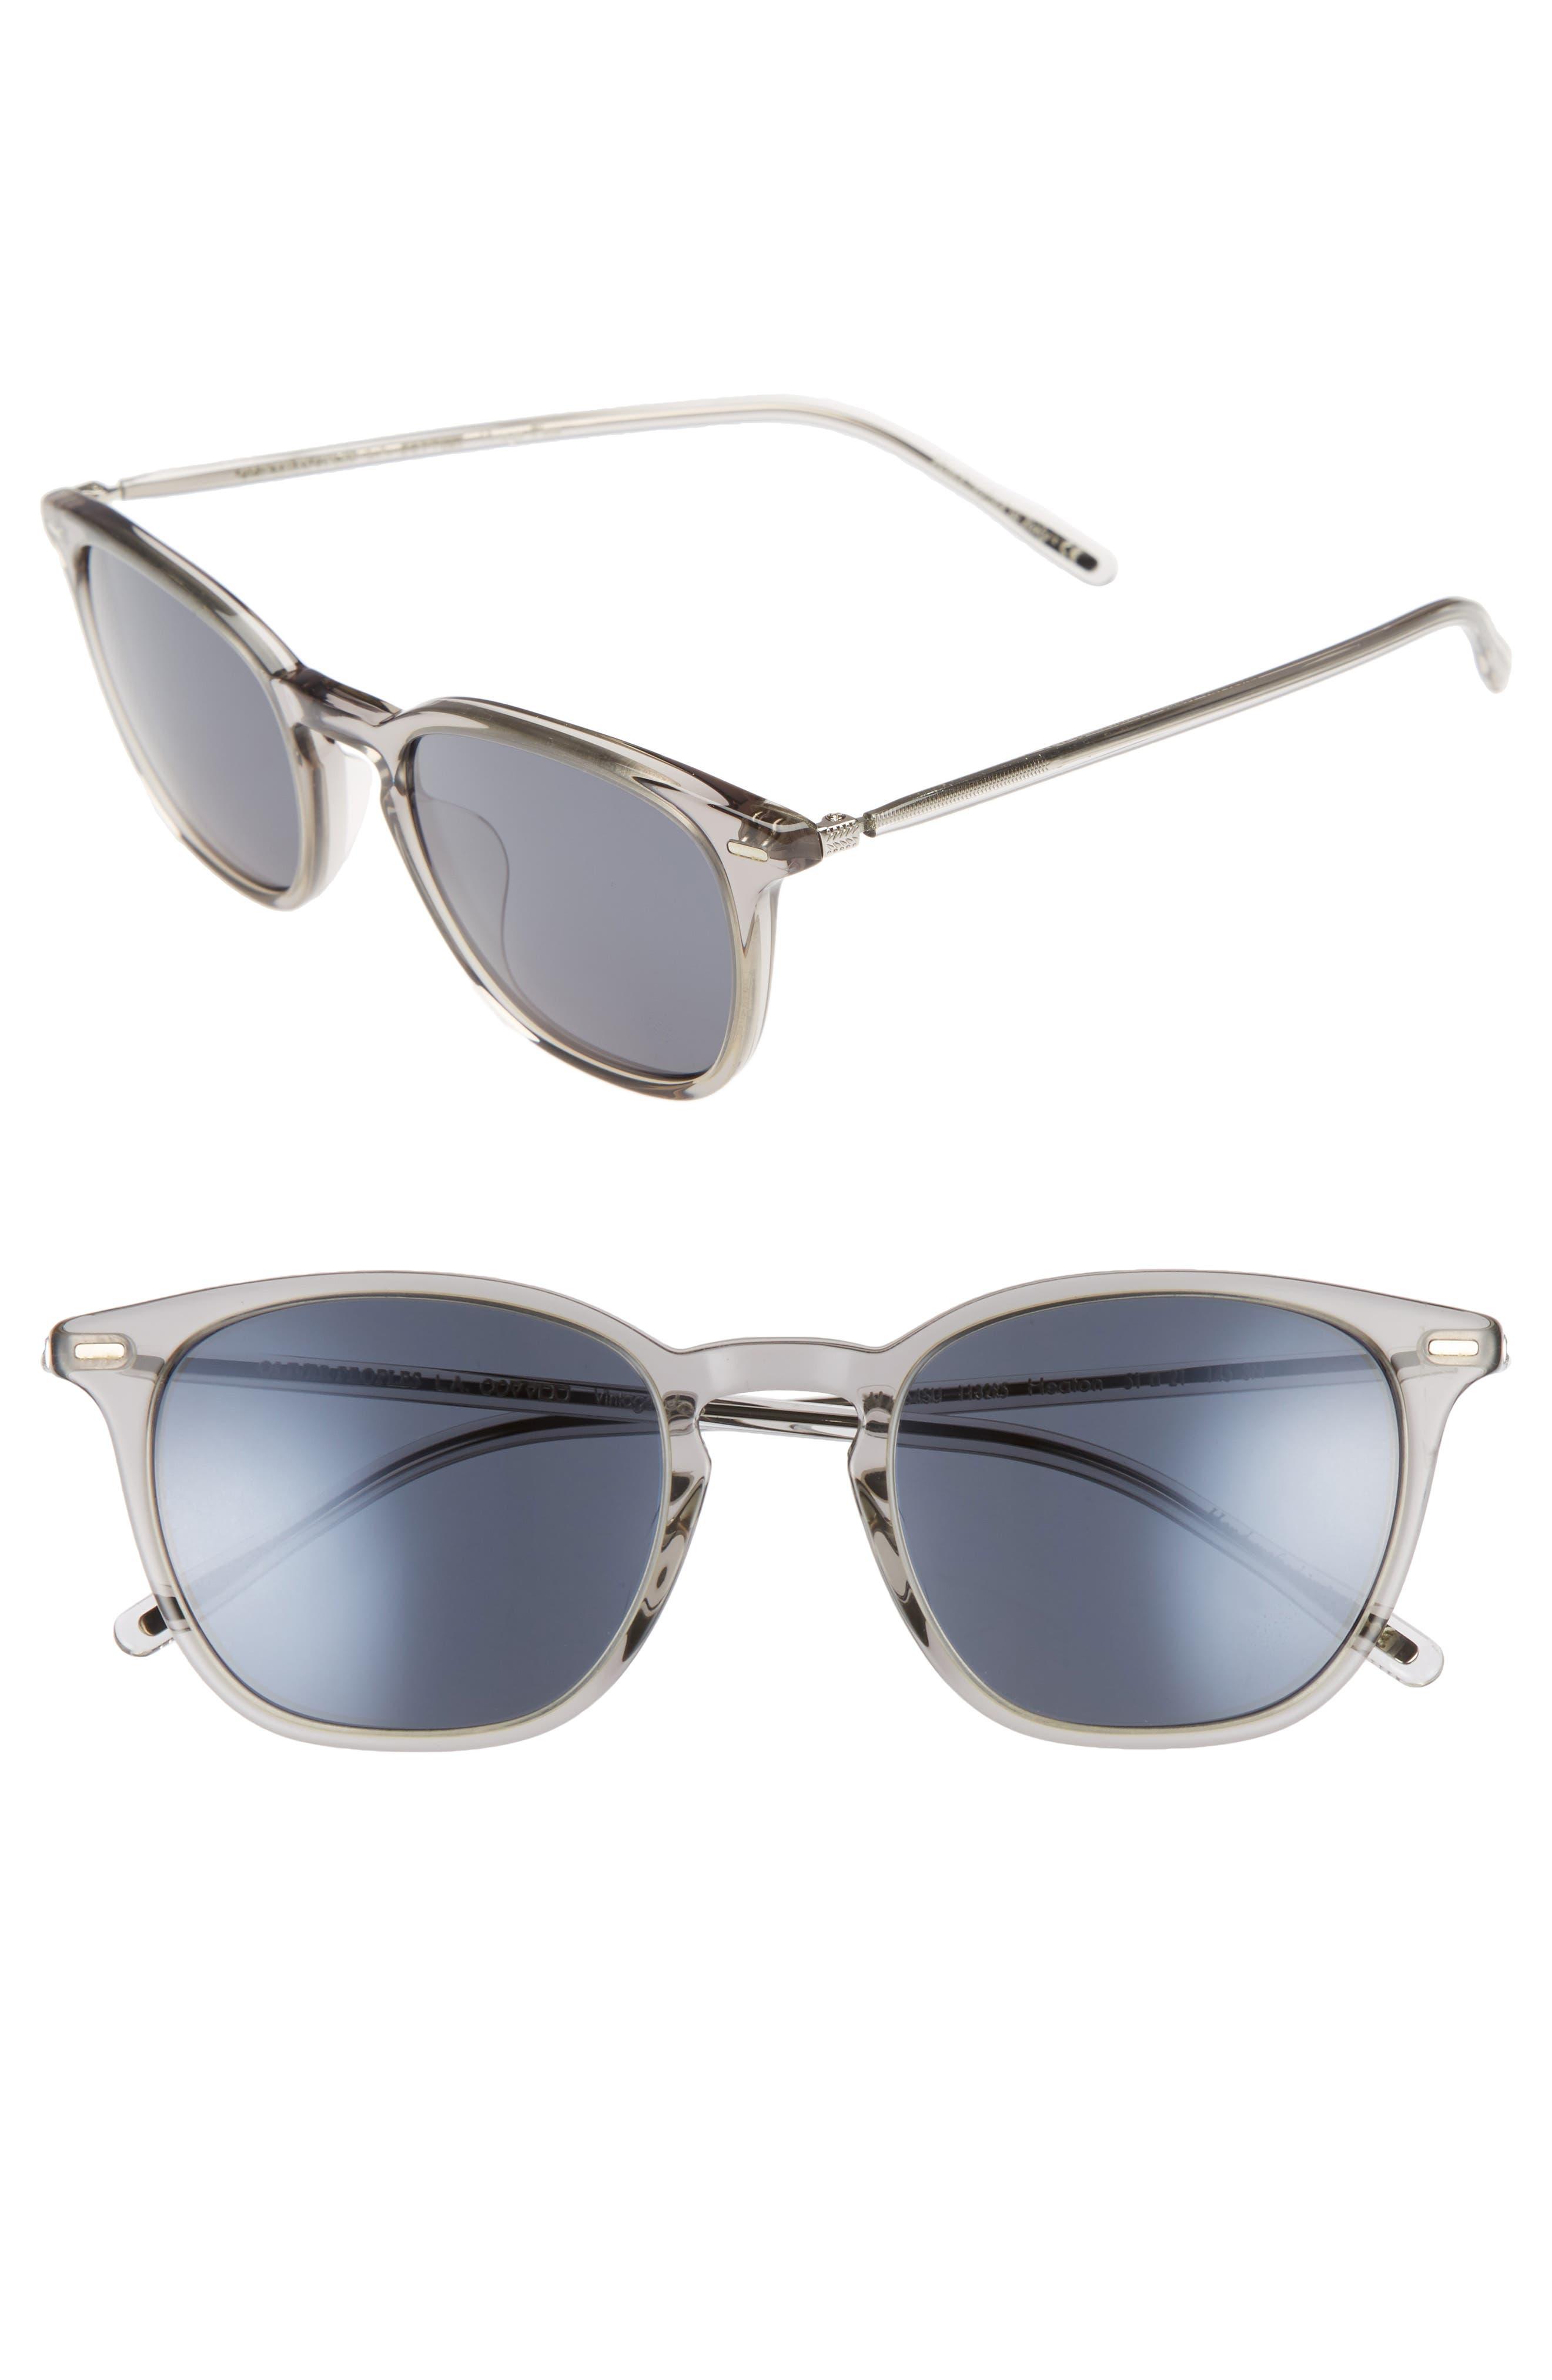 Main Image - Oliver Peoples Heaton 51mm Sunglasses